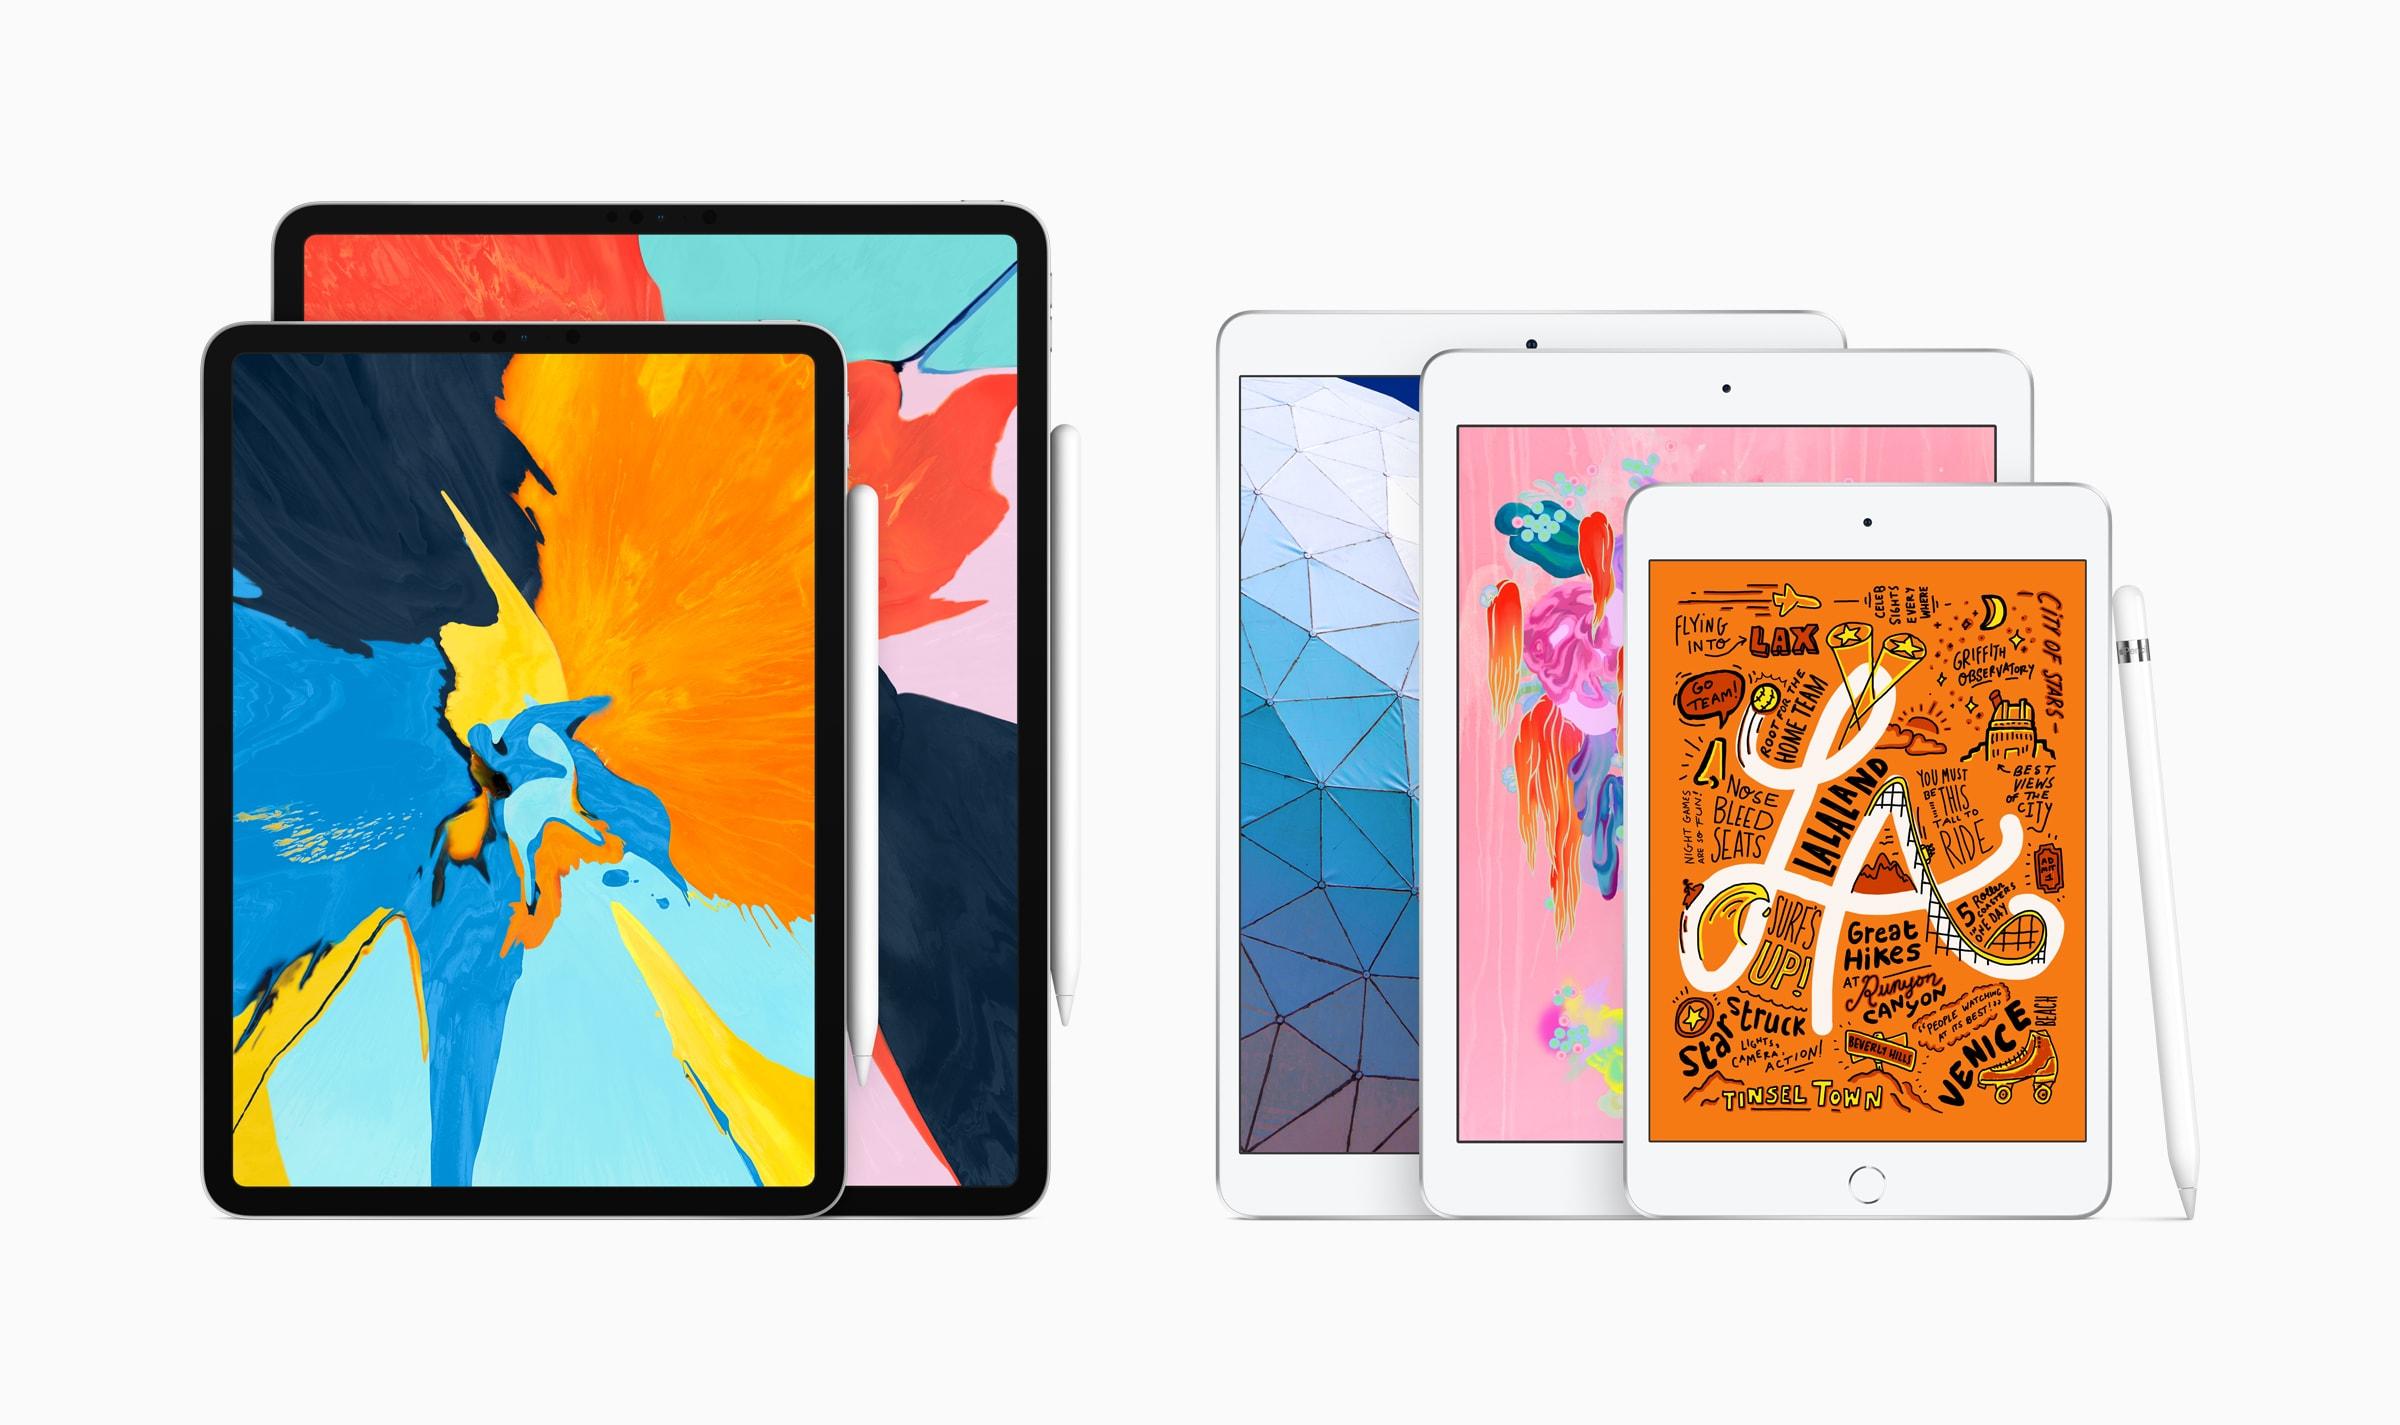 New line of iPads Pro, iPad Air, iPad and iPad mini